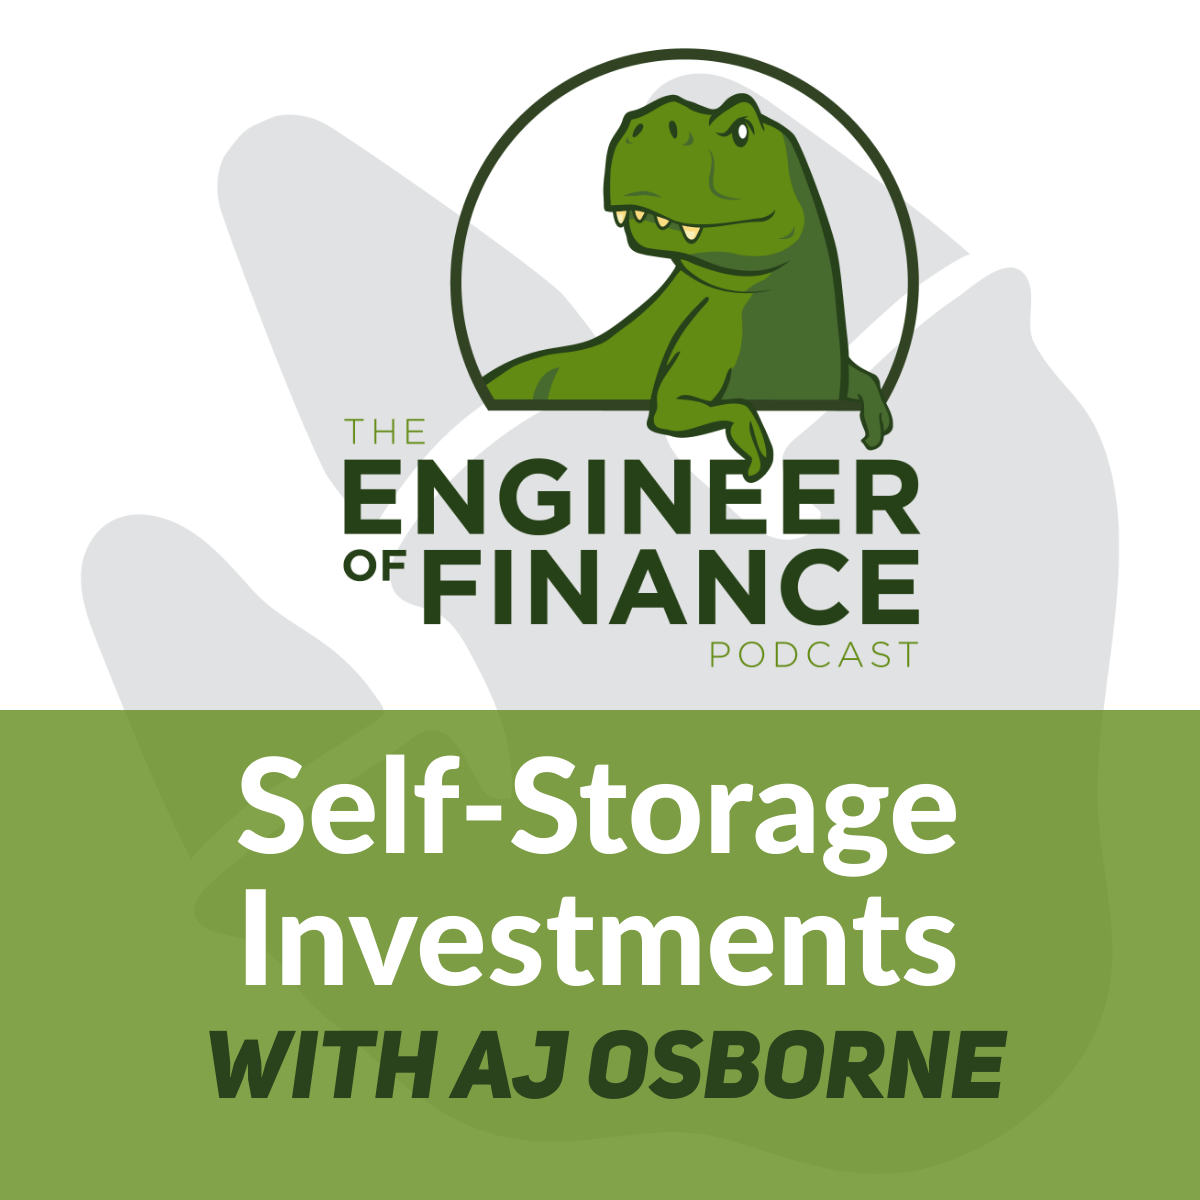 Self-Storage Investments with AJ Osborne – Episode 144